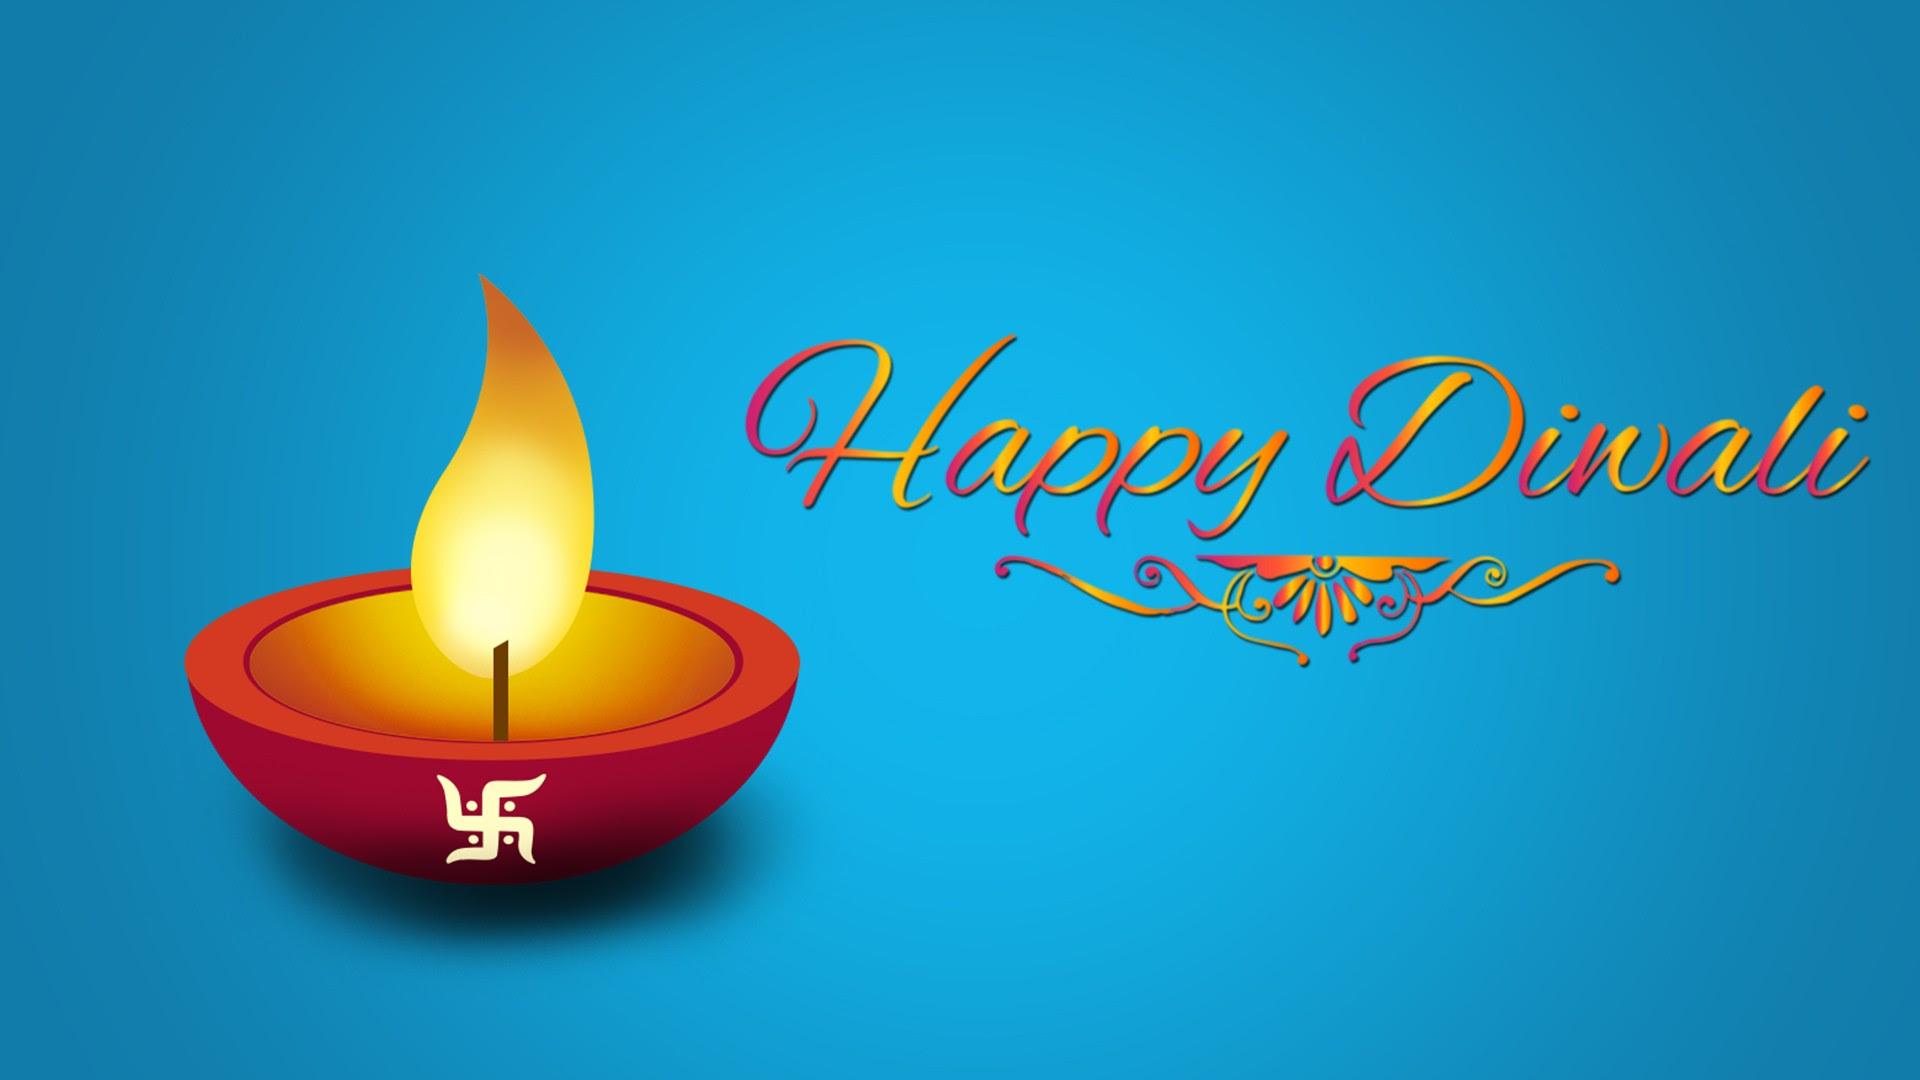 Happy Diwali Hd Wallpapers 34811 Baltana